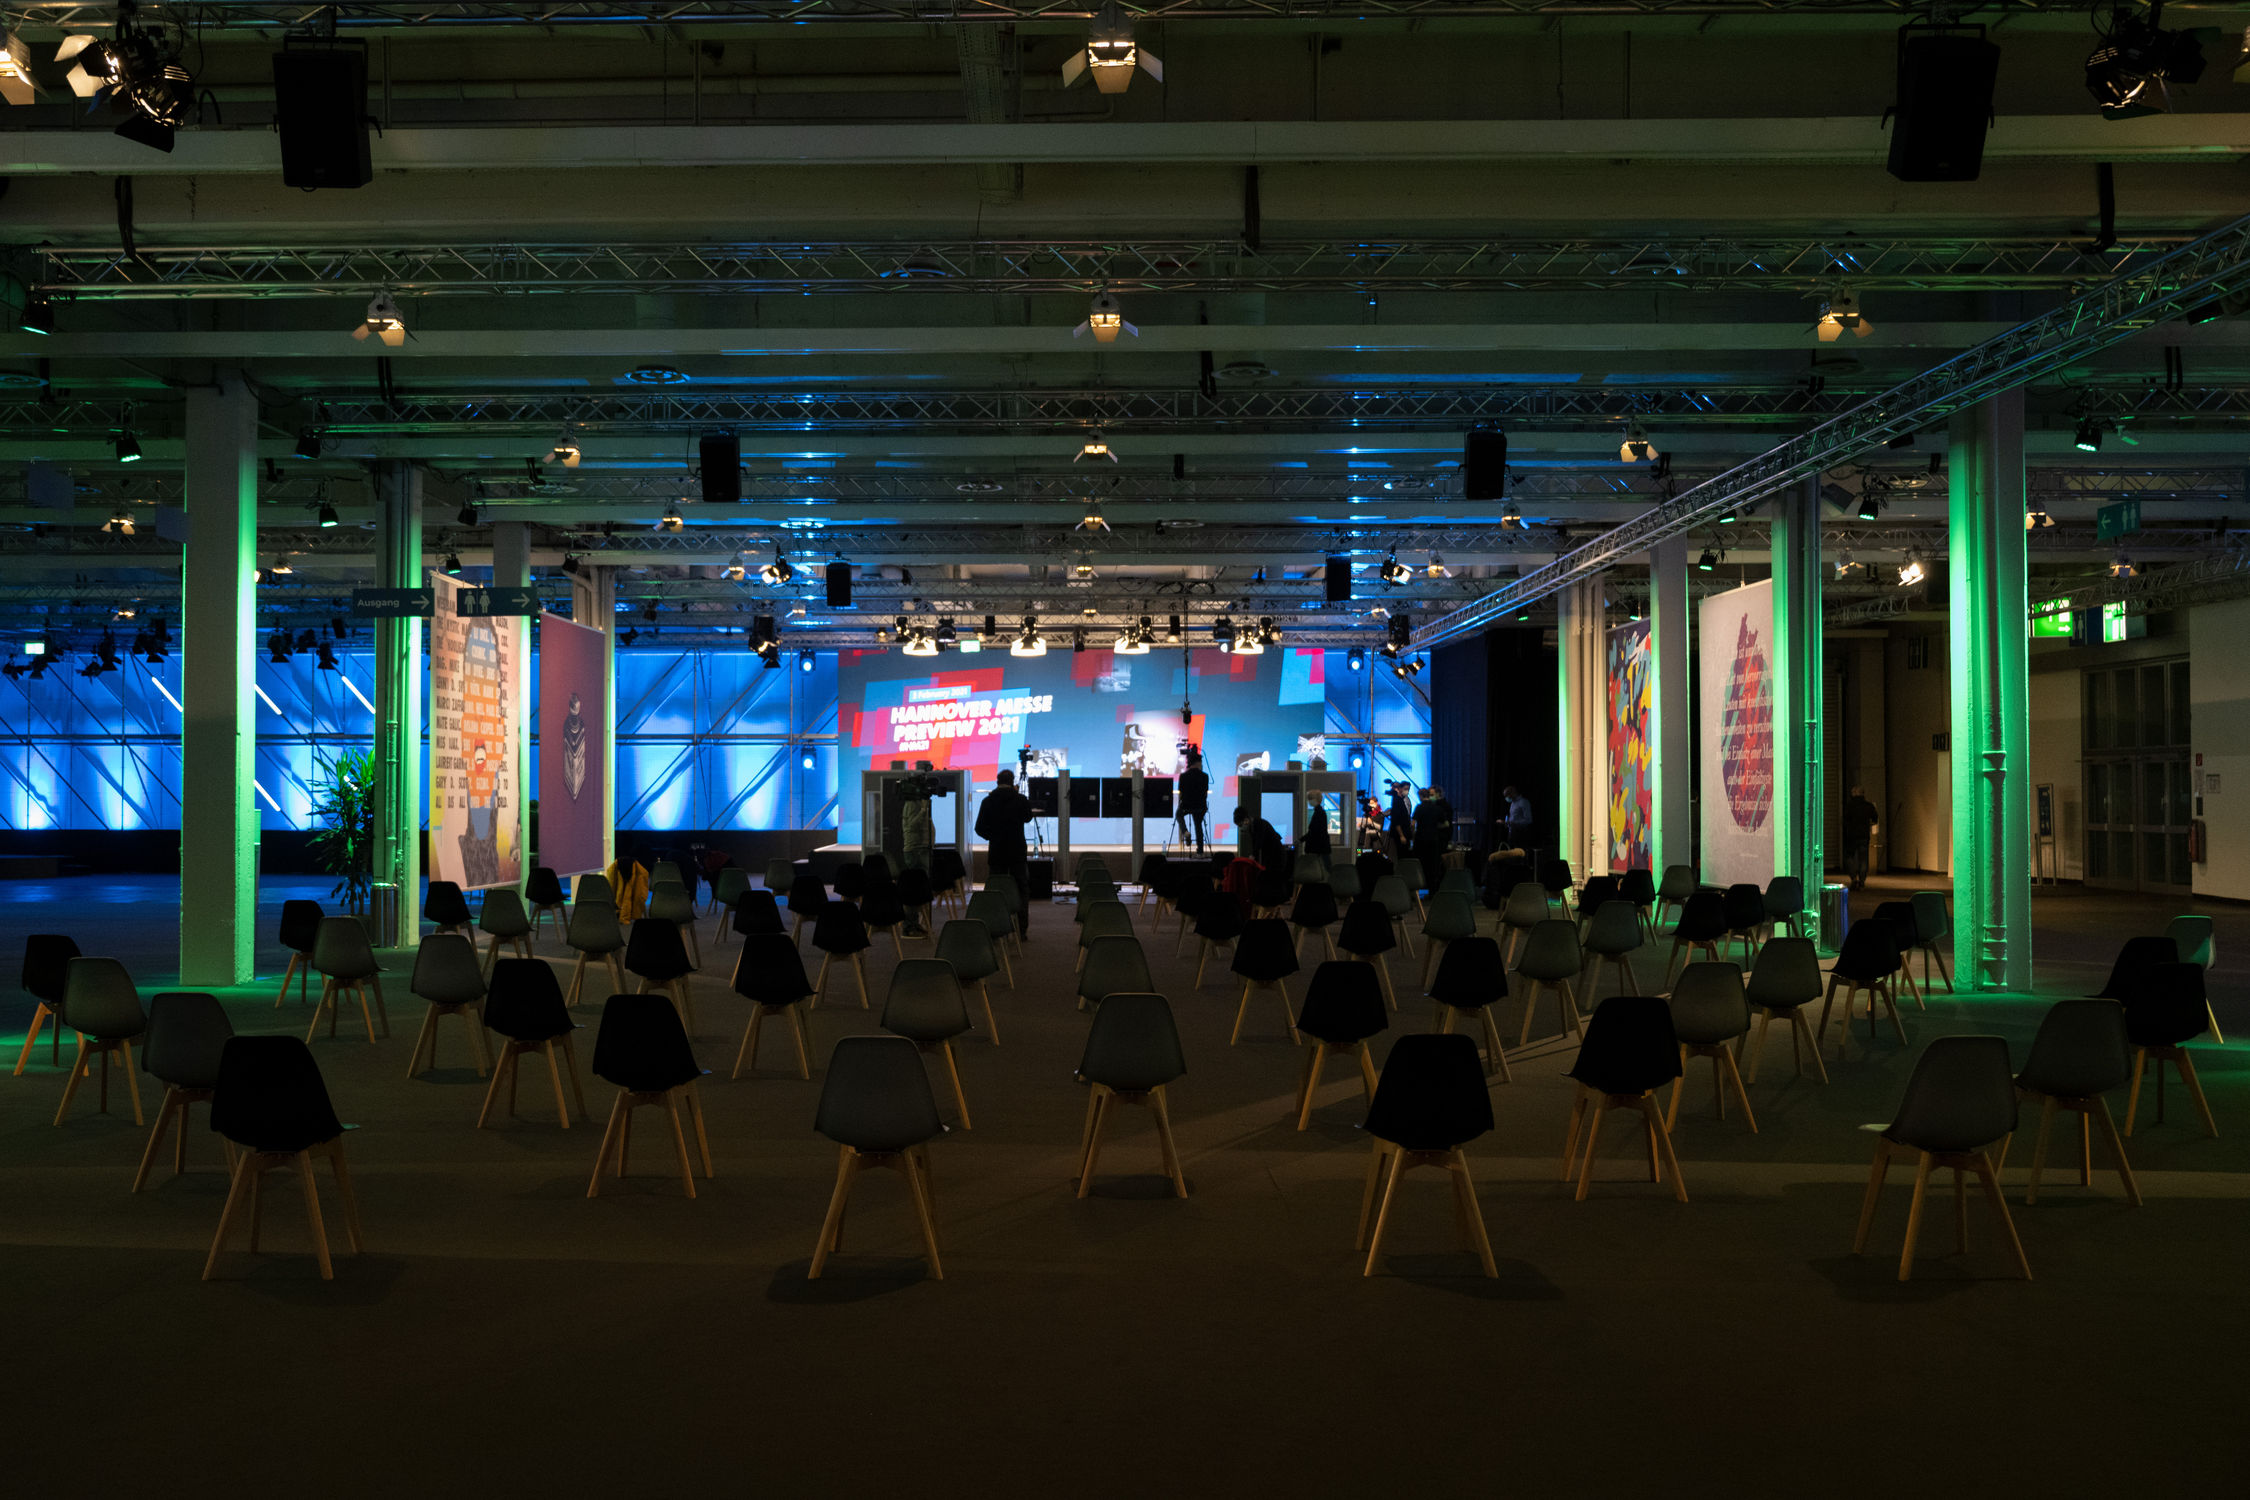 Come See PowerON at Hannover Fair Digital Edition 2021